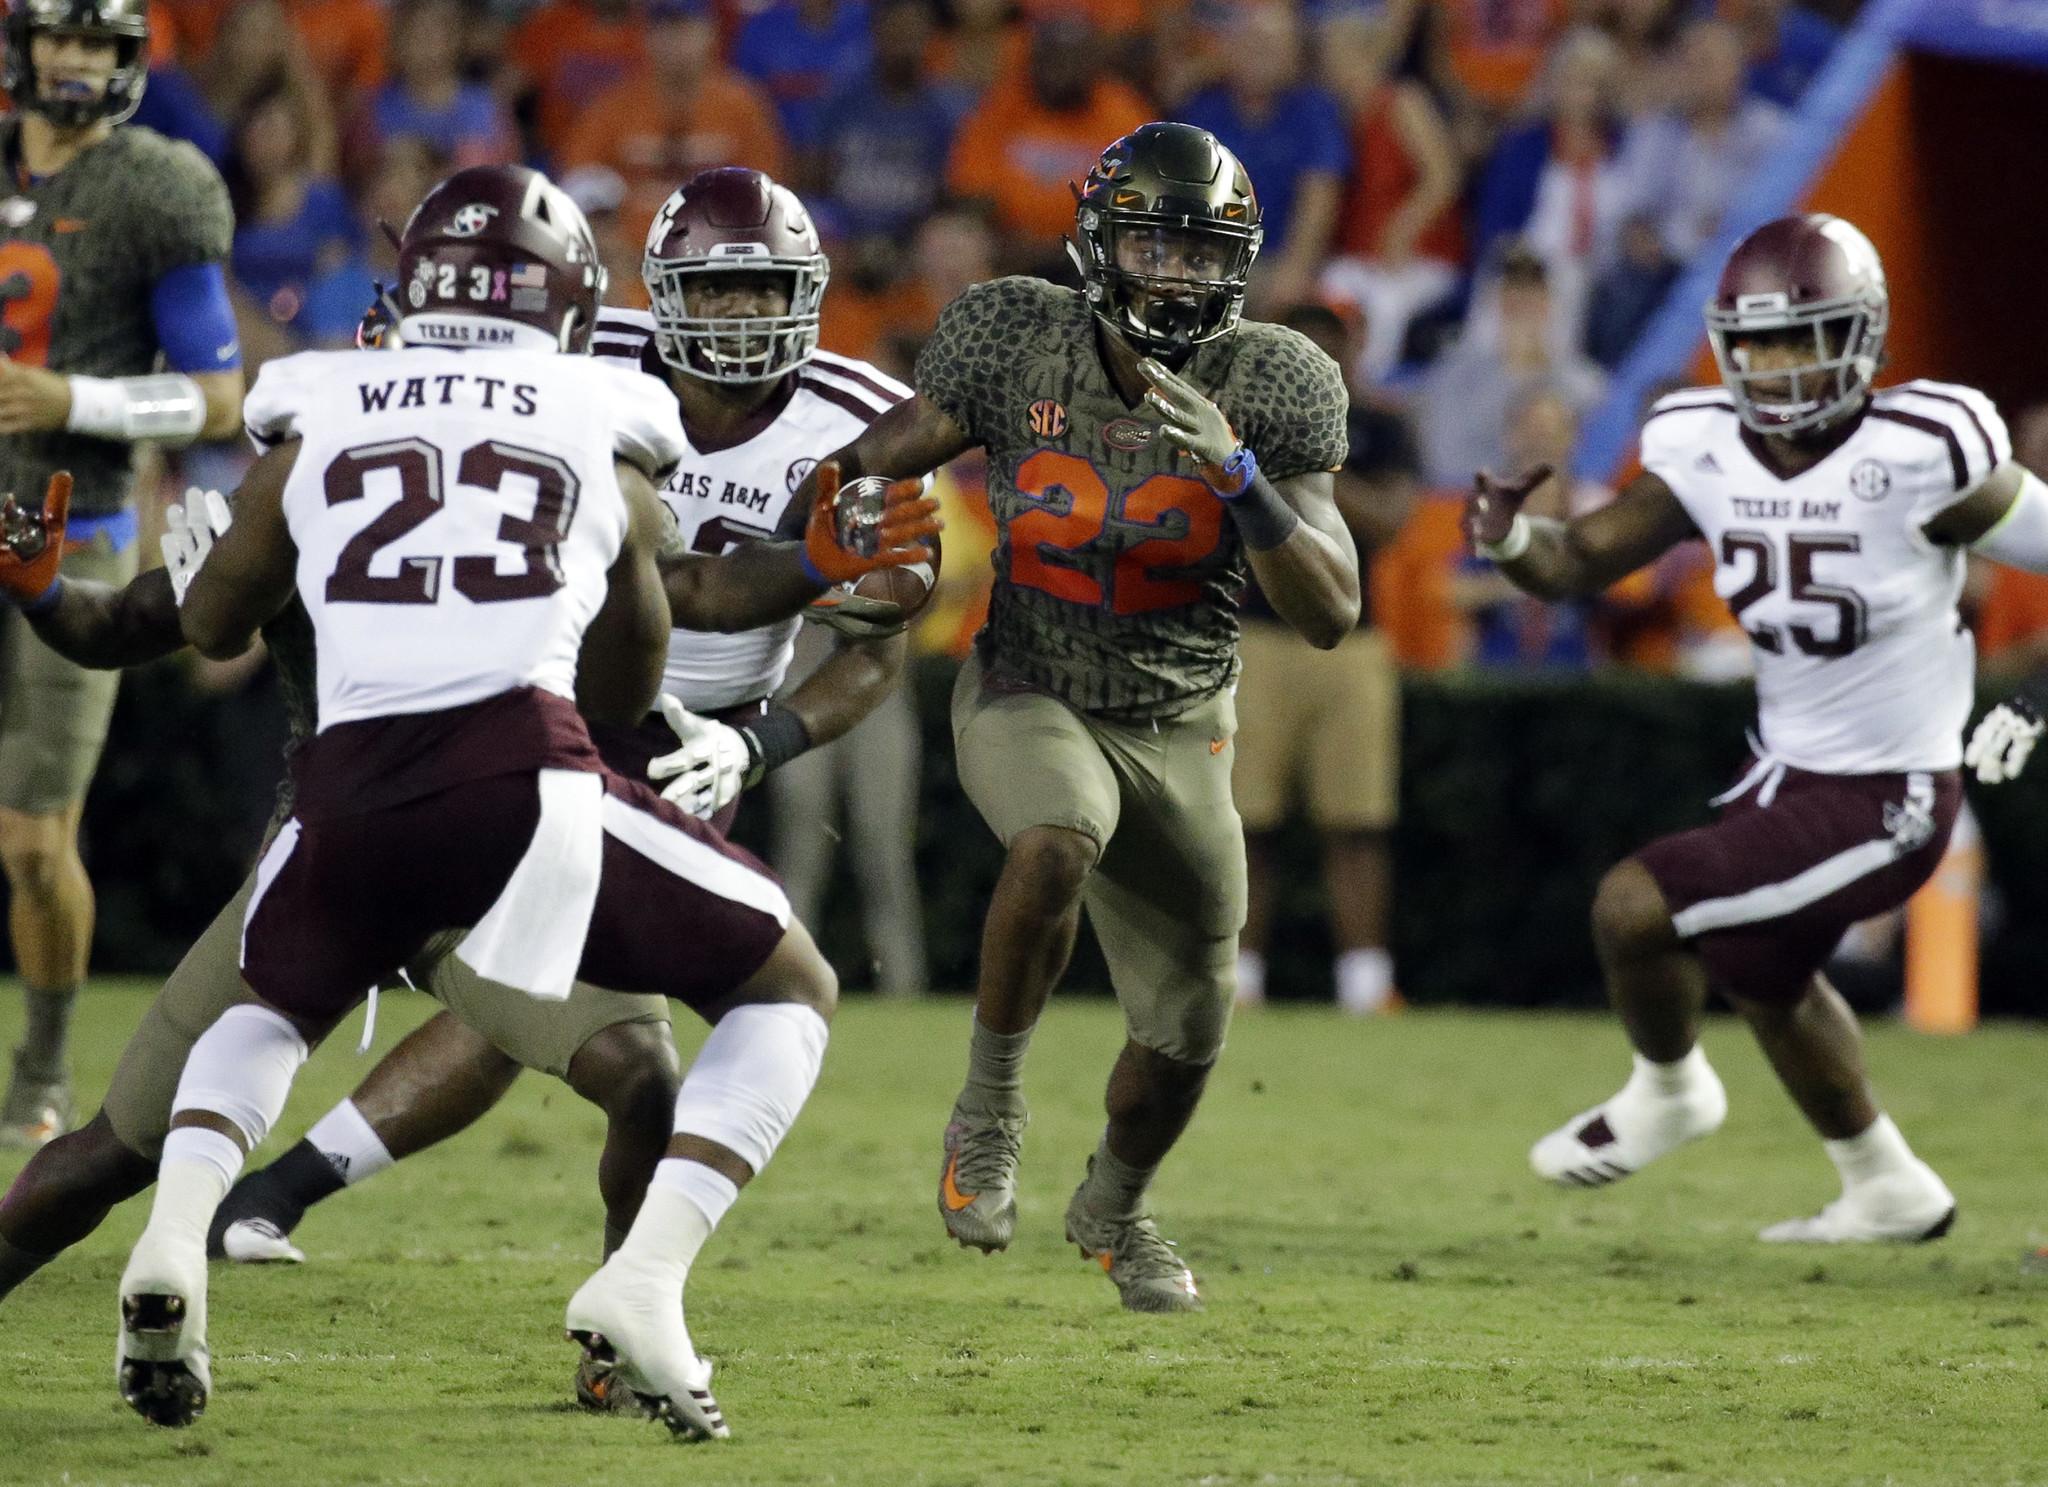 Os-sp-gators-texas-am-football-1015